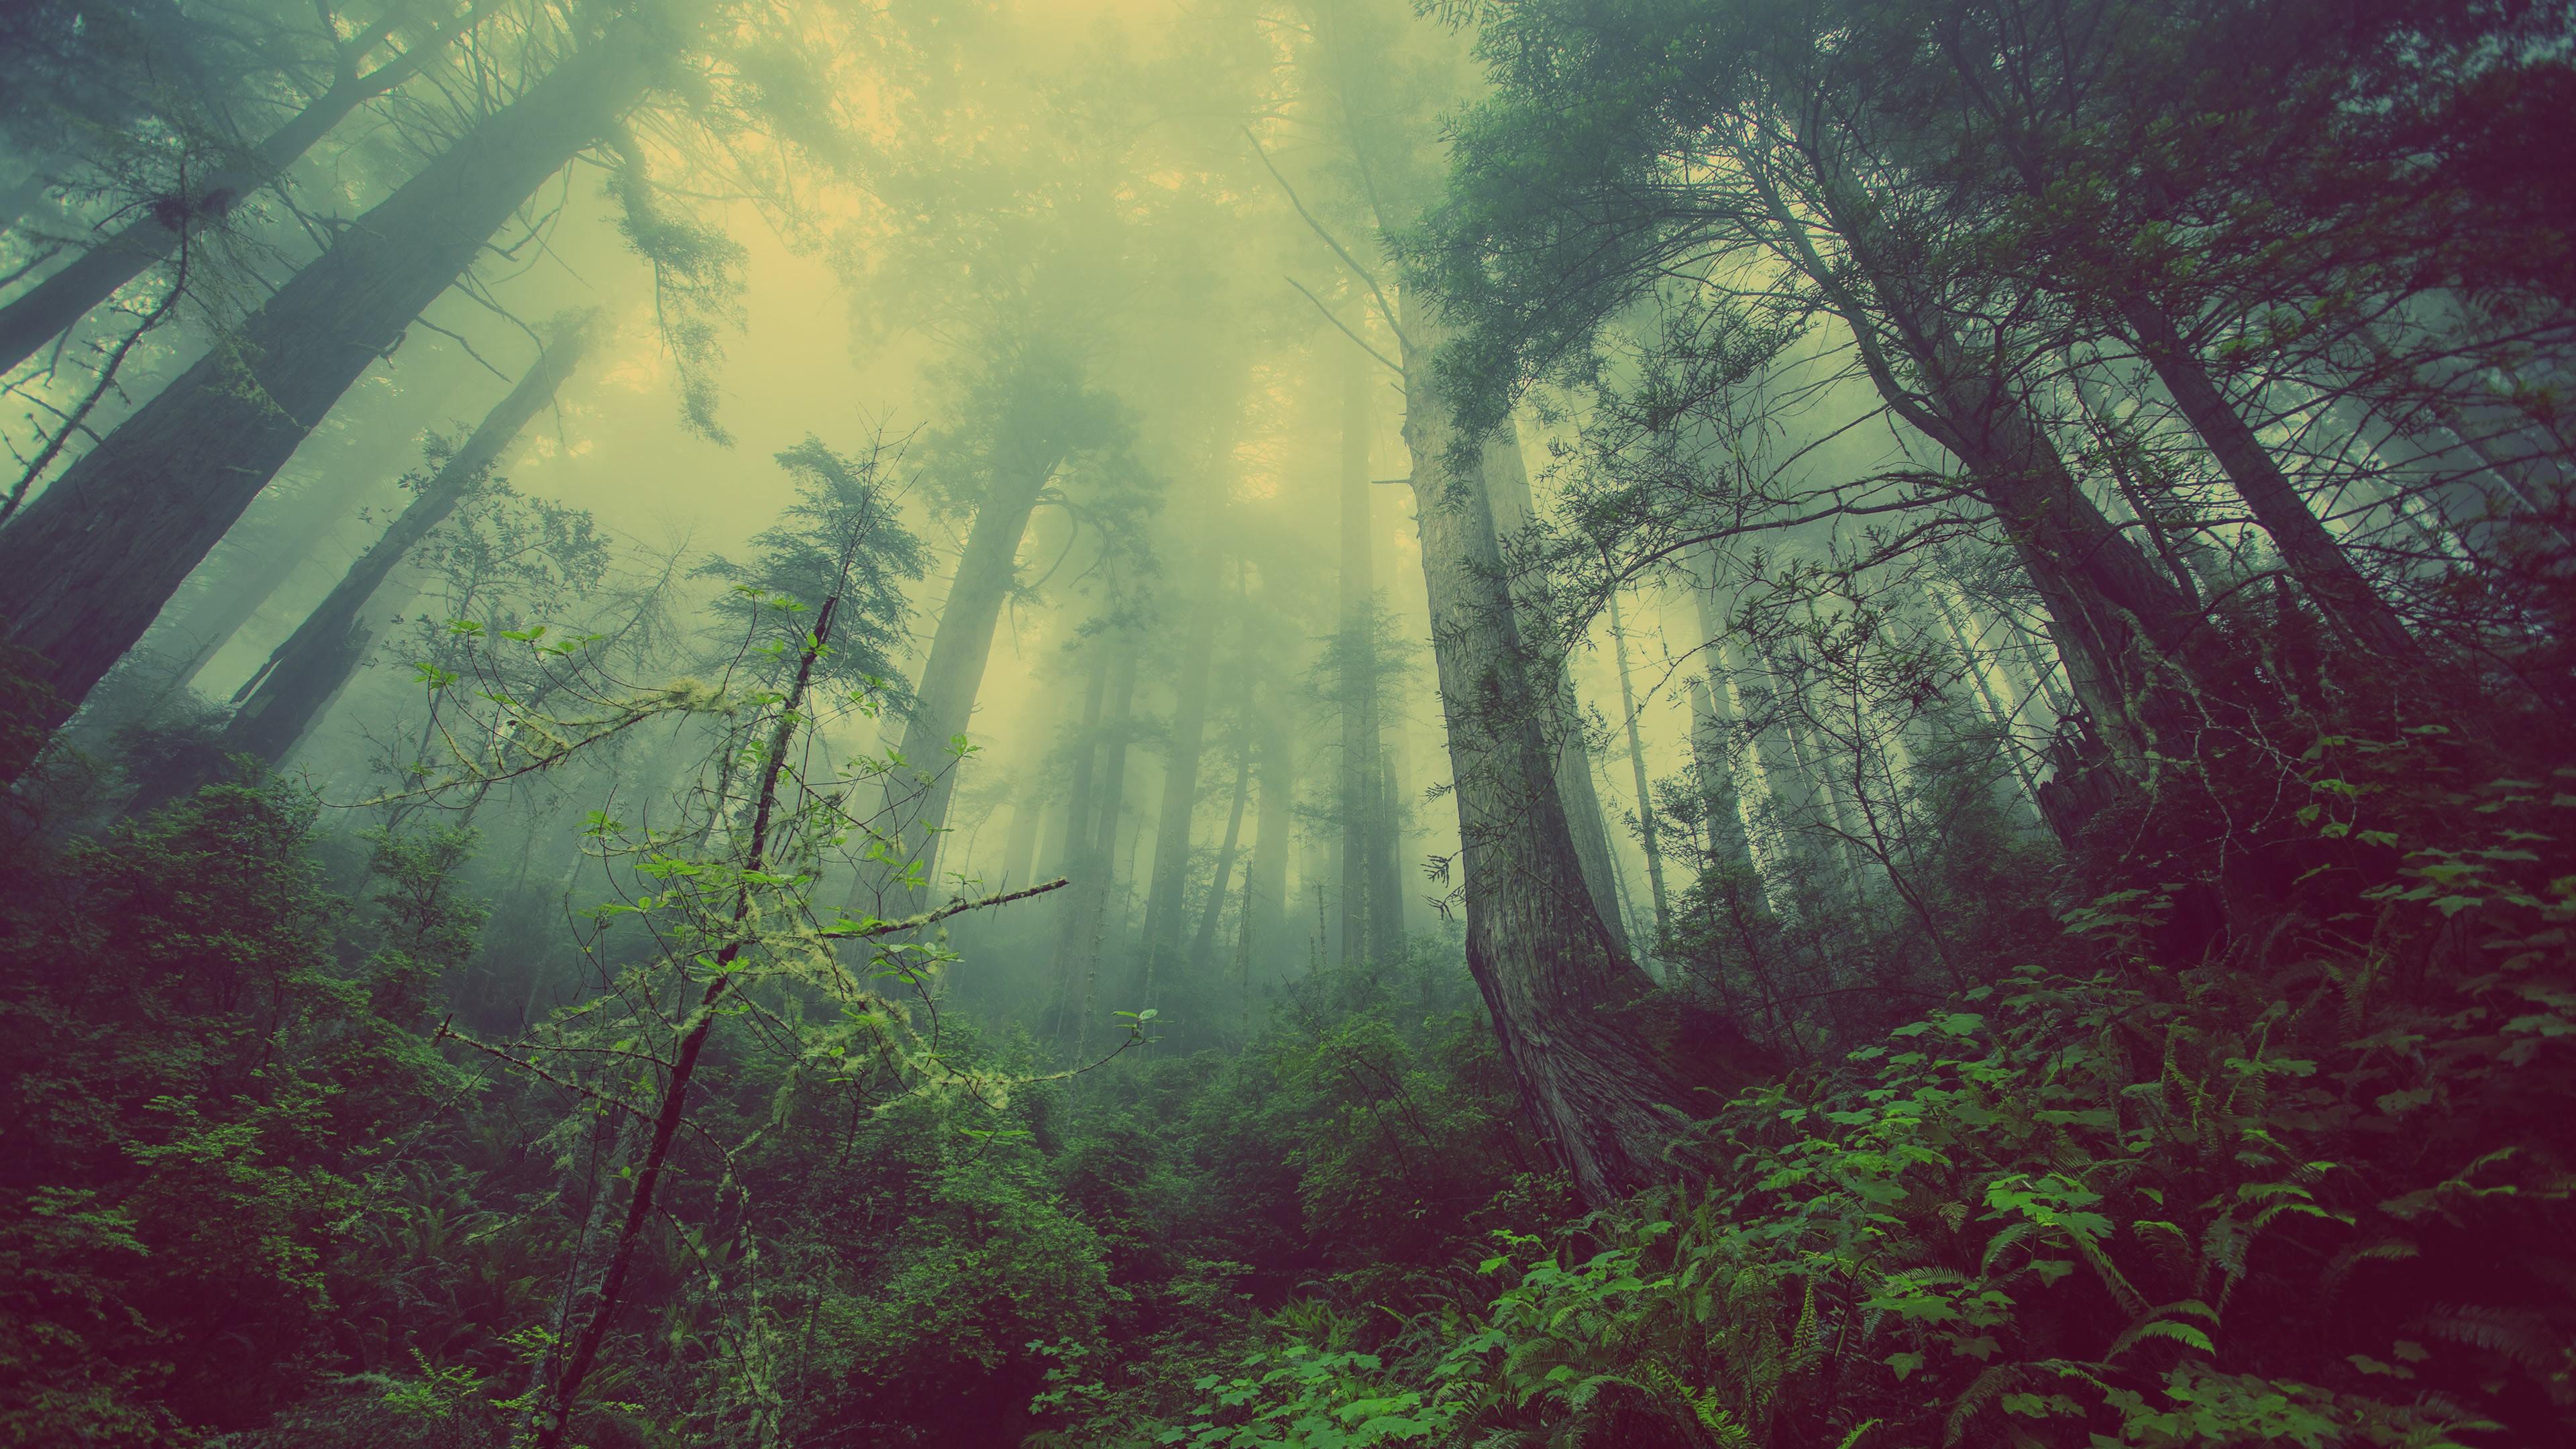 General 3840x2160 forest jungle trees green haze mist